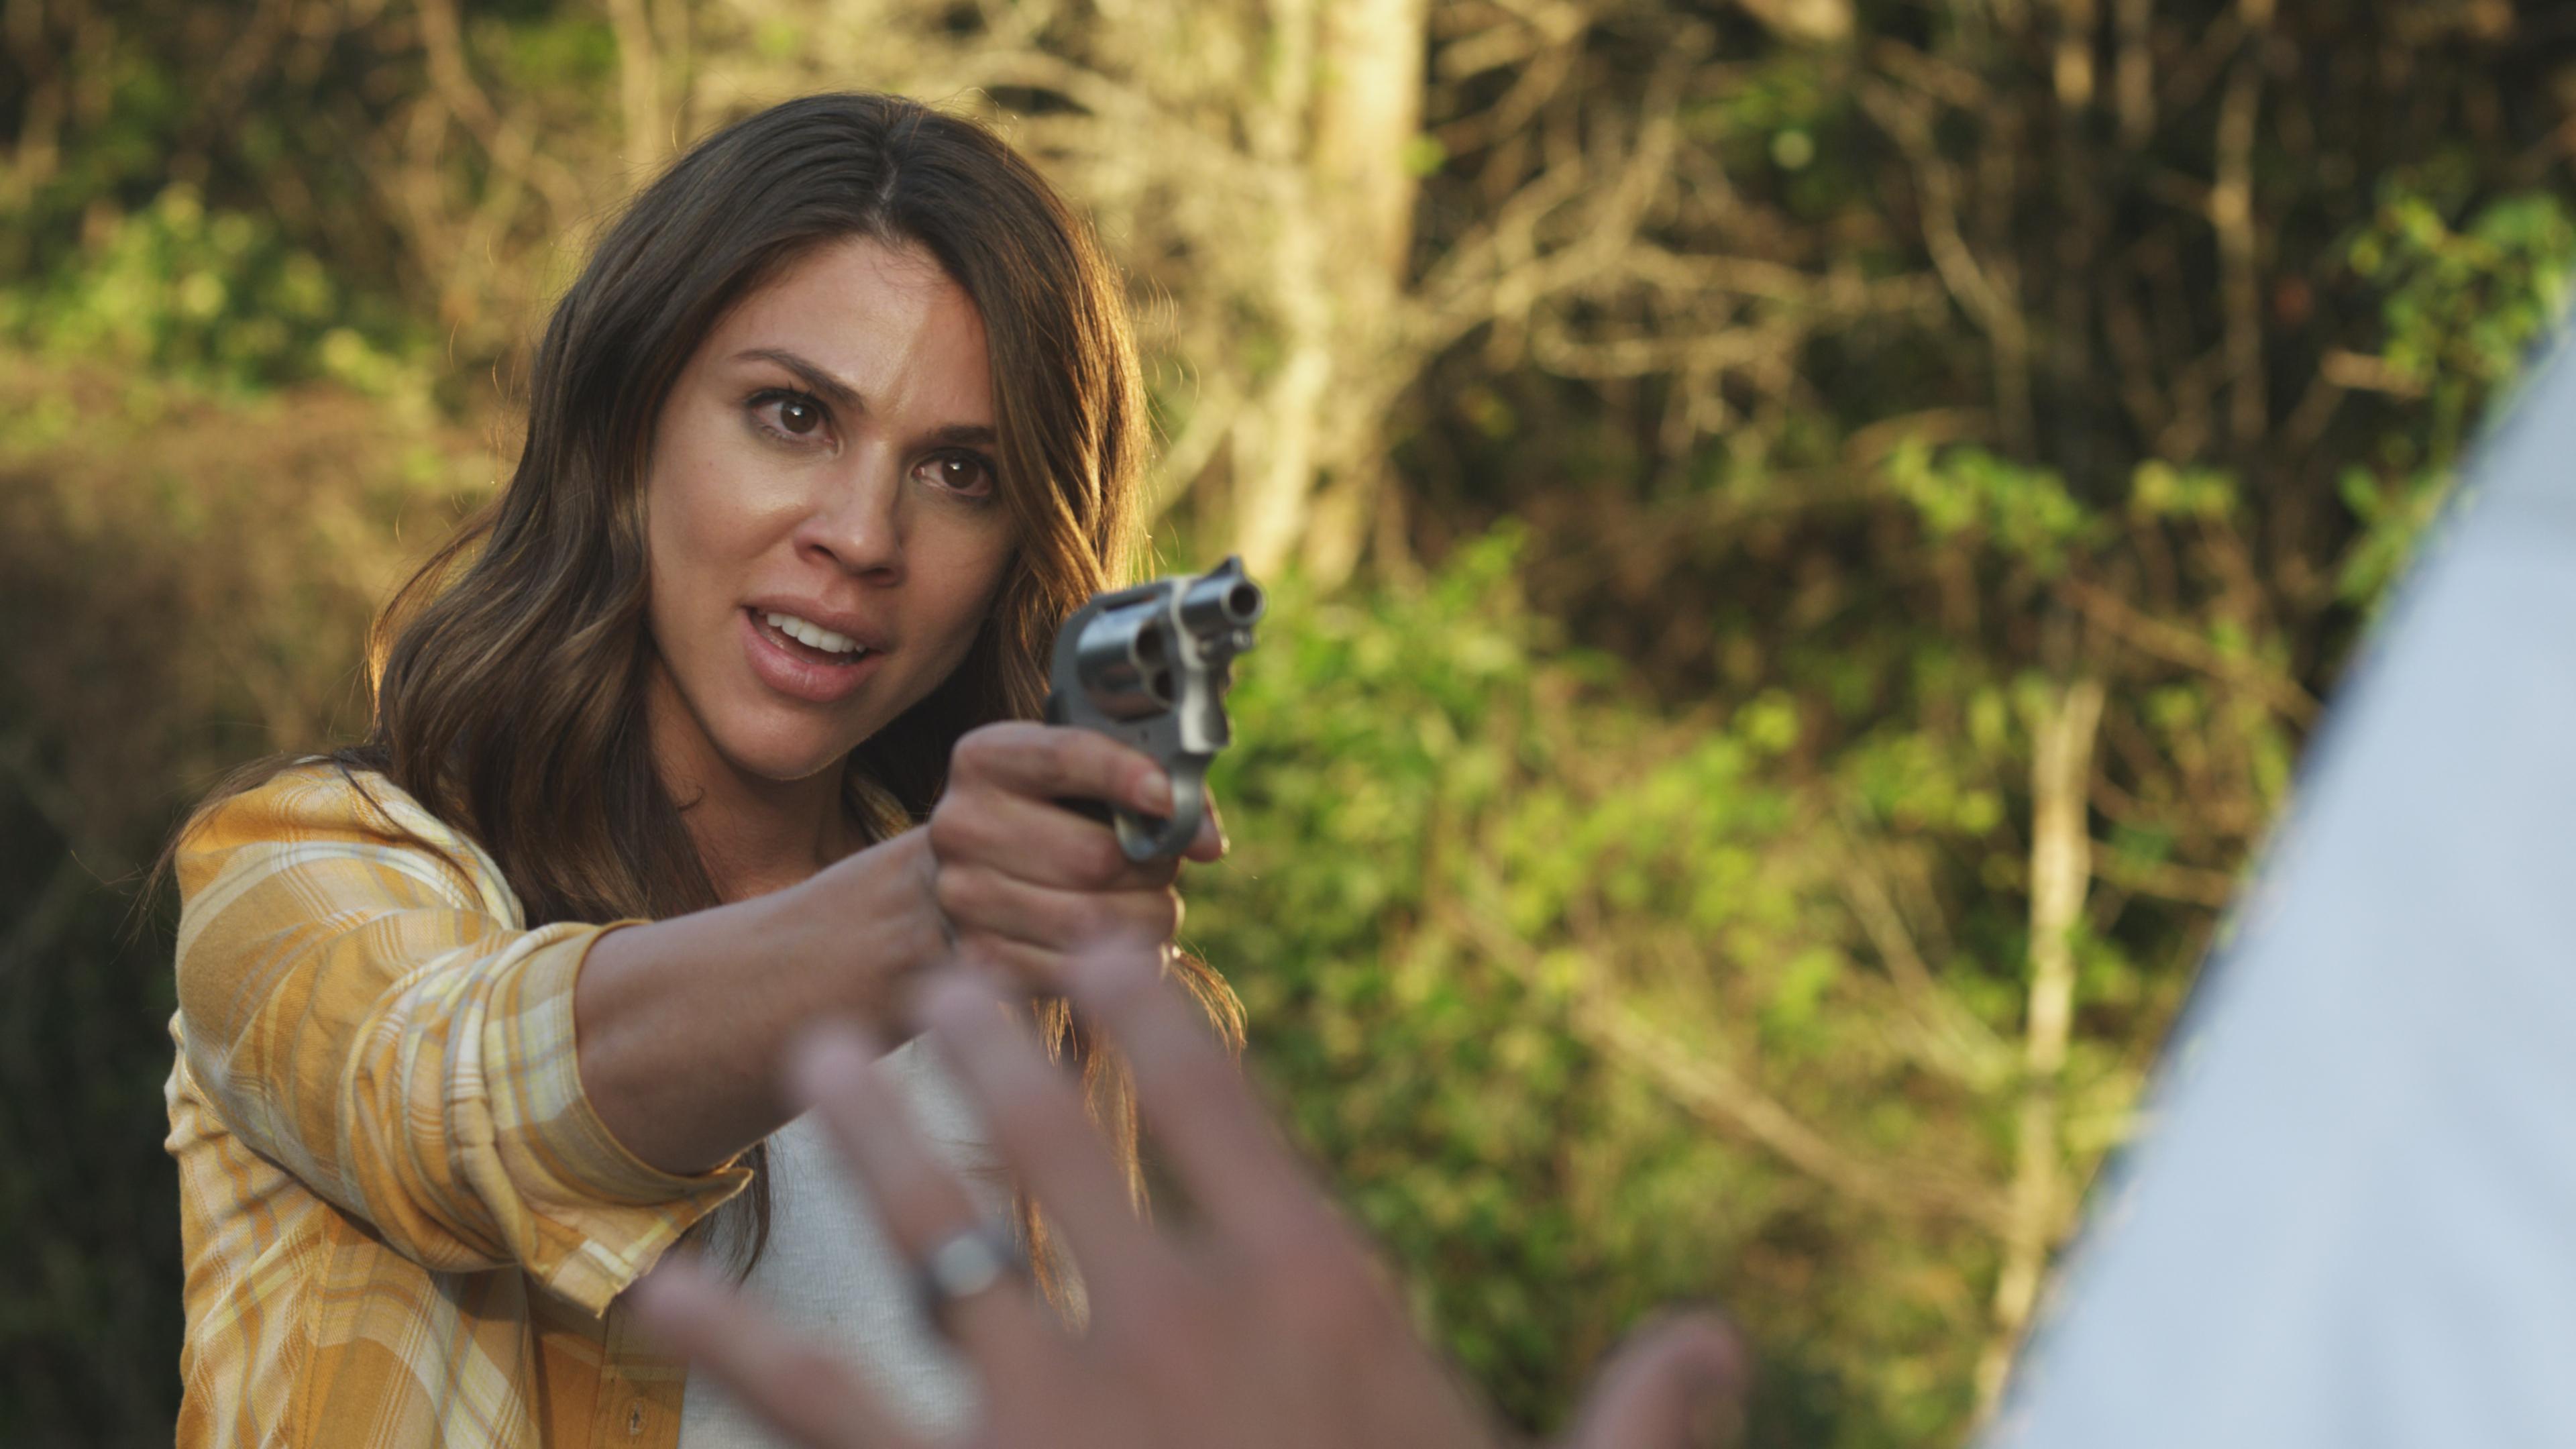 Kate Mansi in Boyfriend Killer - A+E